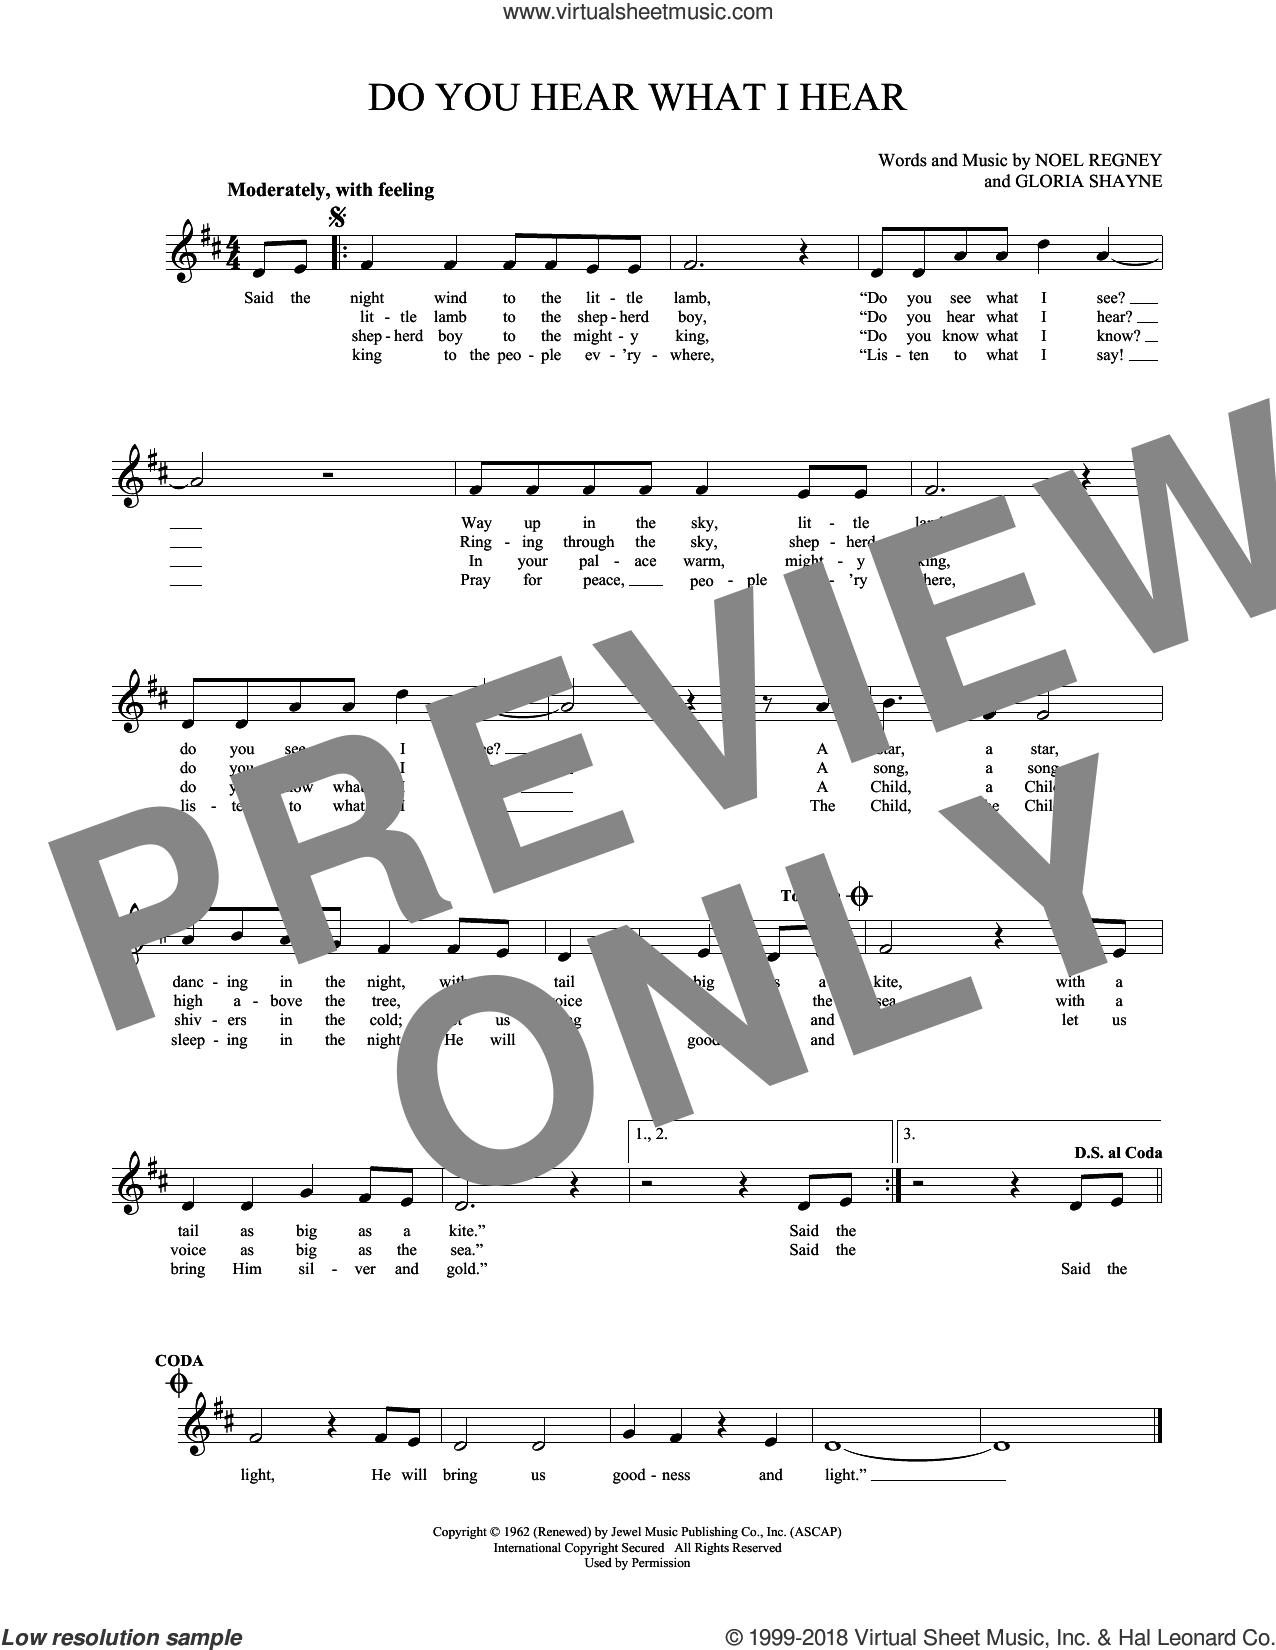 Do You Hear What I Hear sheet music for ocarina solo by Gloria Shayne and Noel Regney, intermediate skill level